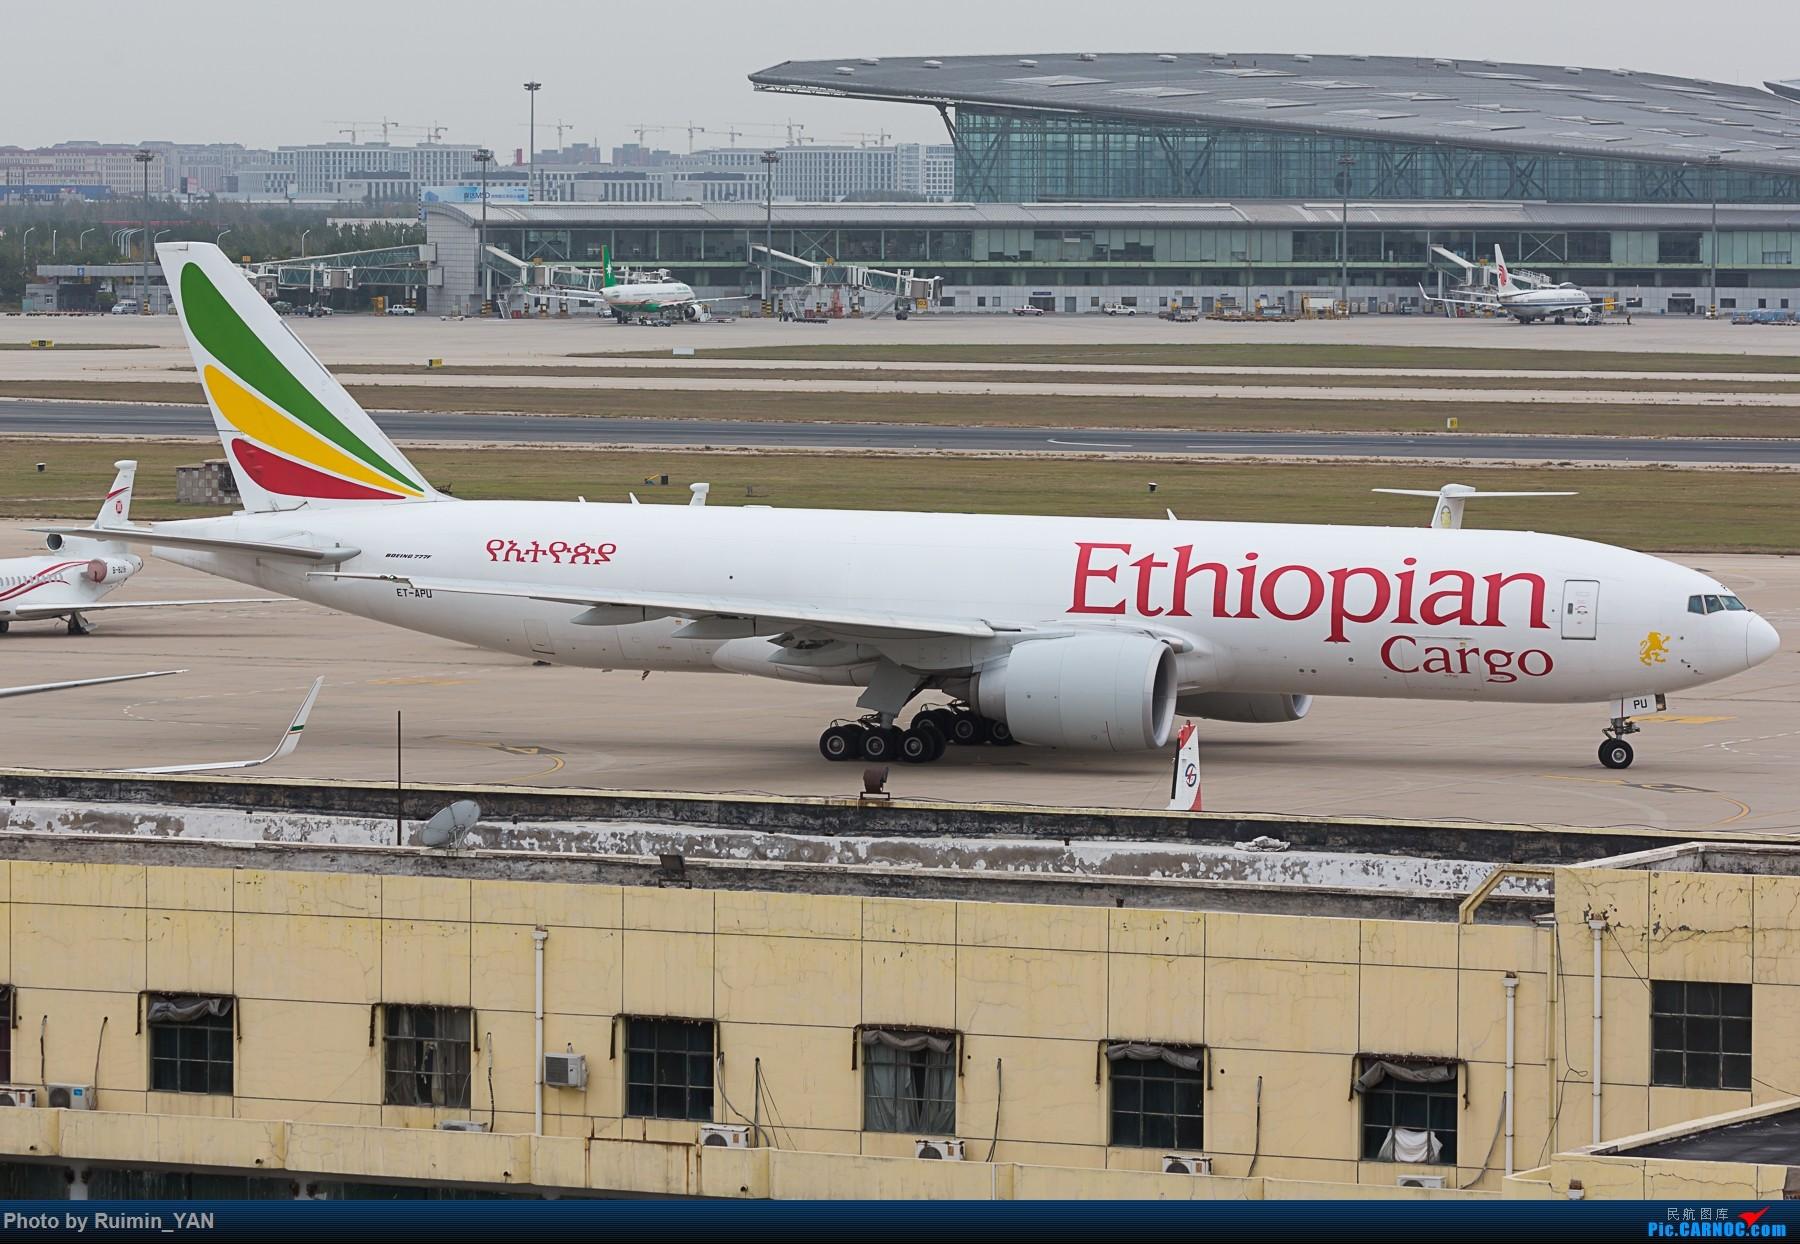 [原创]【TSN】【卡狗】埃塞尔比亚航空(ET, Ethiopian Airlines) ET-APU 77F BOEING 777-200 ET-APU 中国天津滨海国际机场